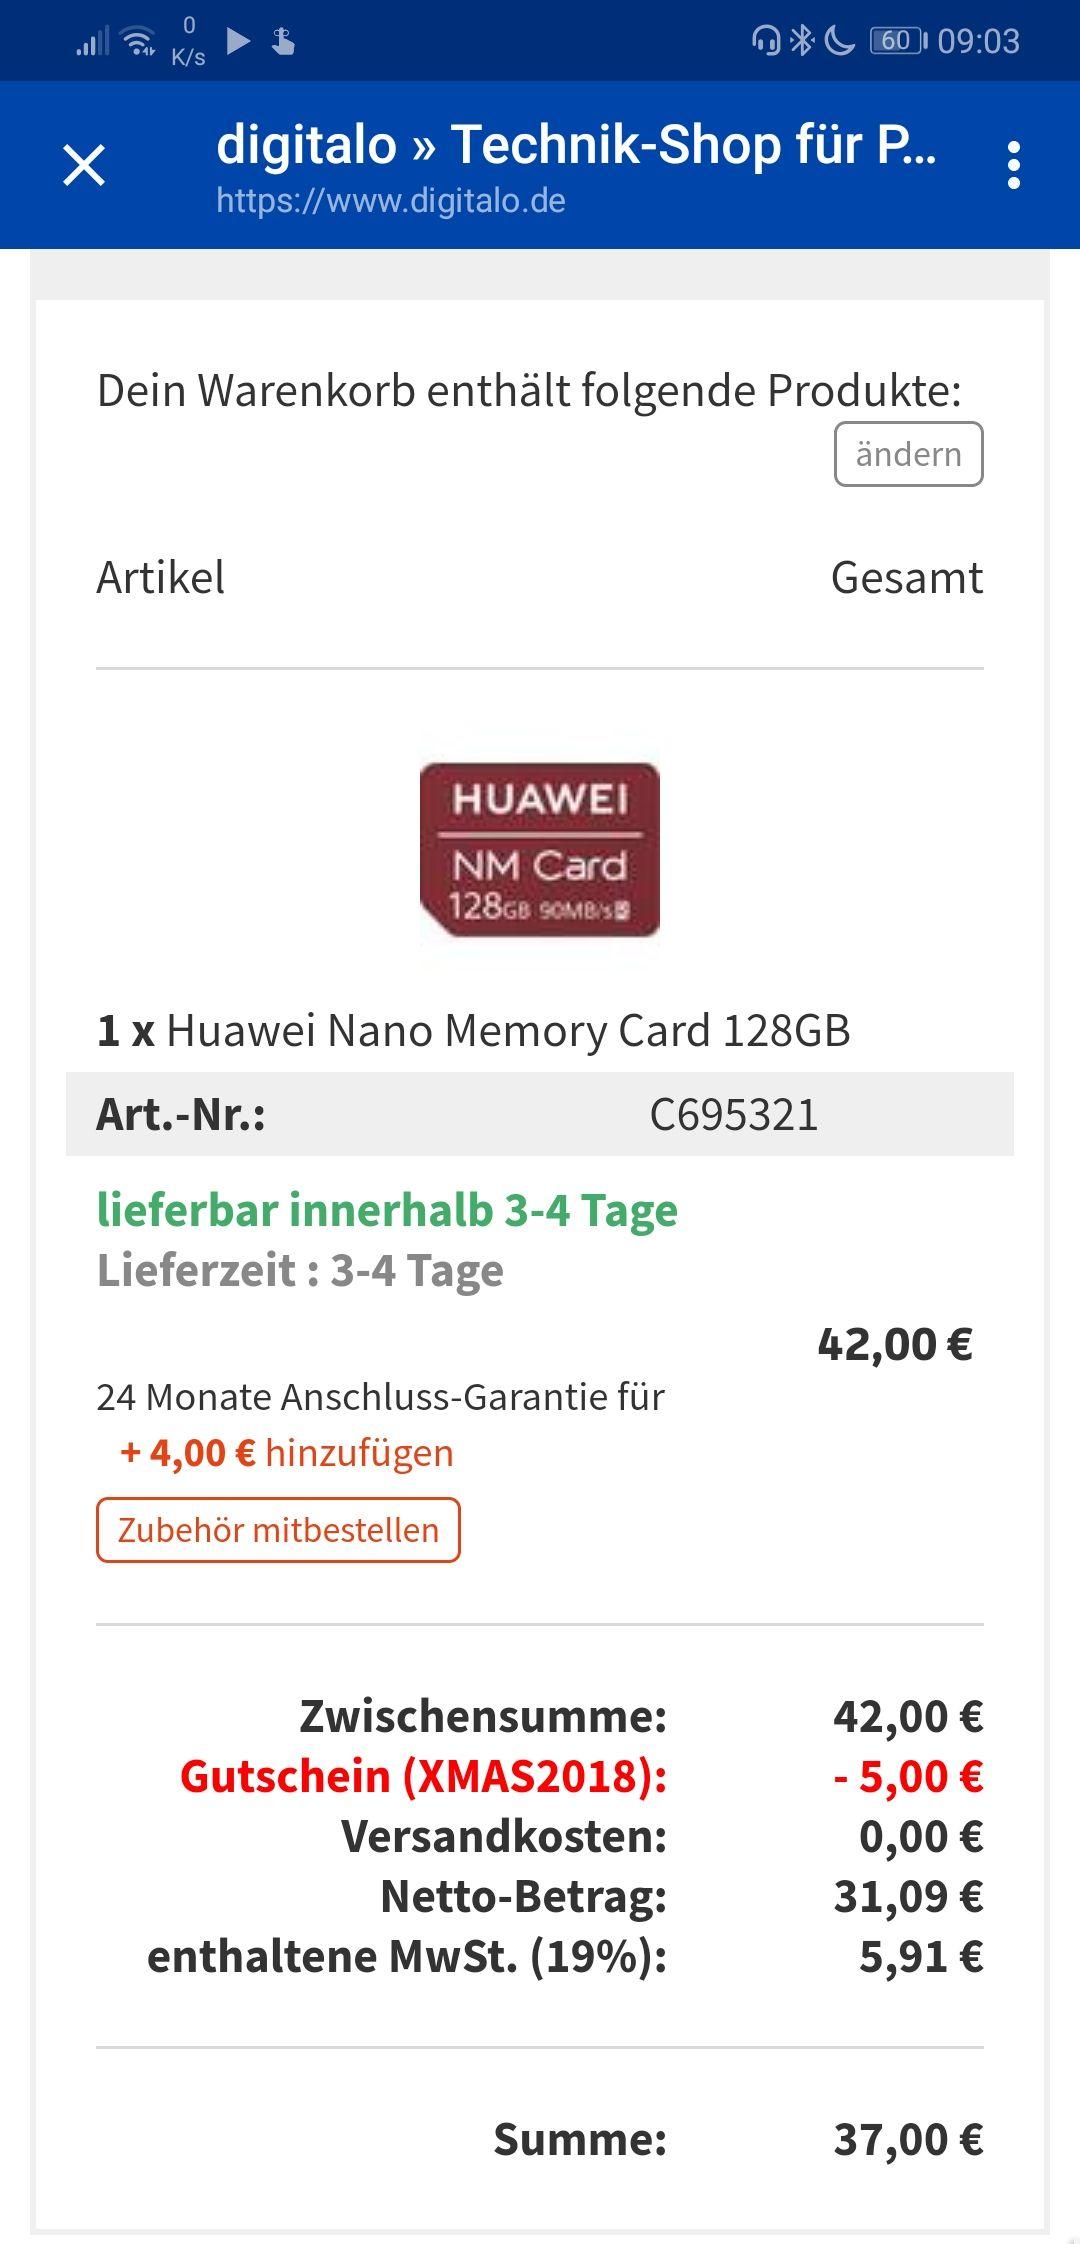 Huawei nano memory card 128 GB (Digitalo)